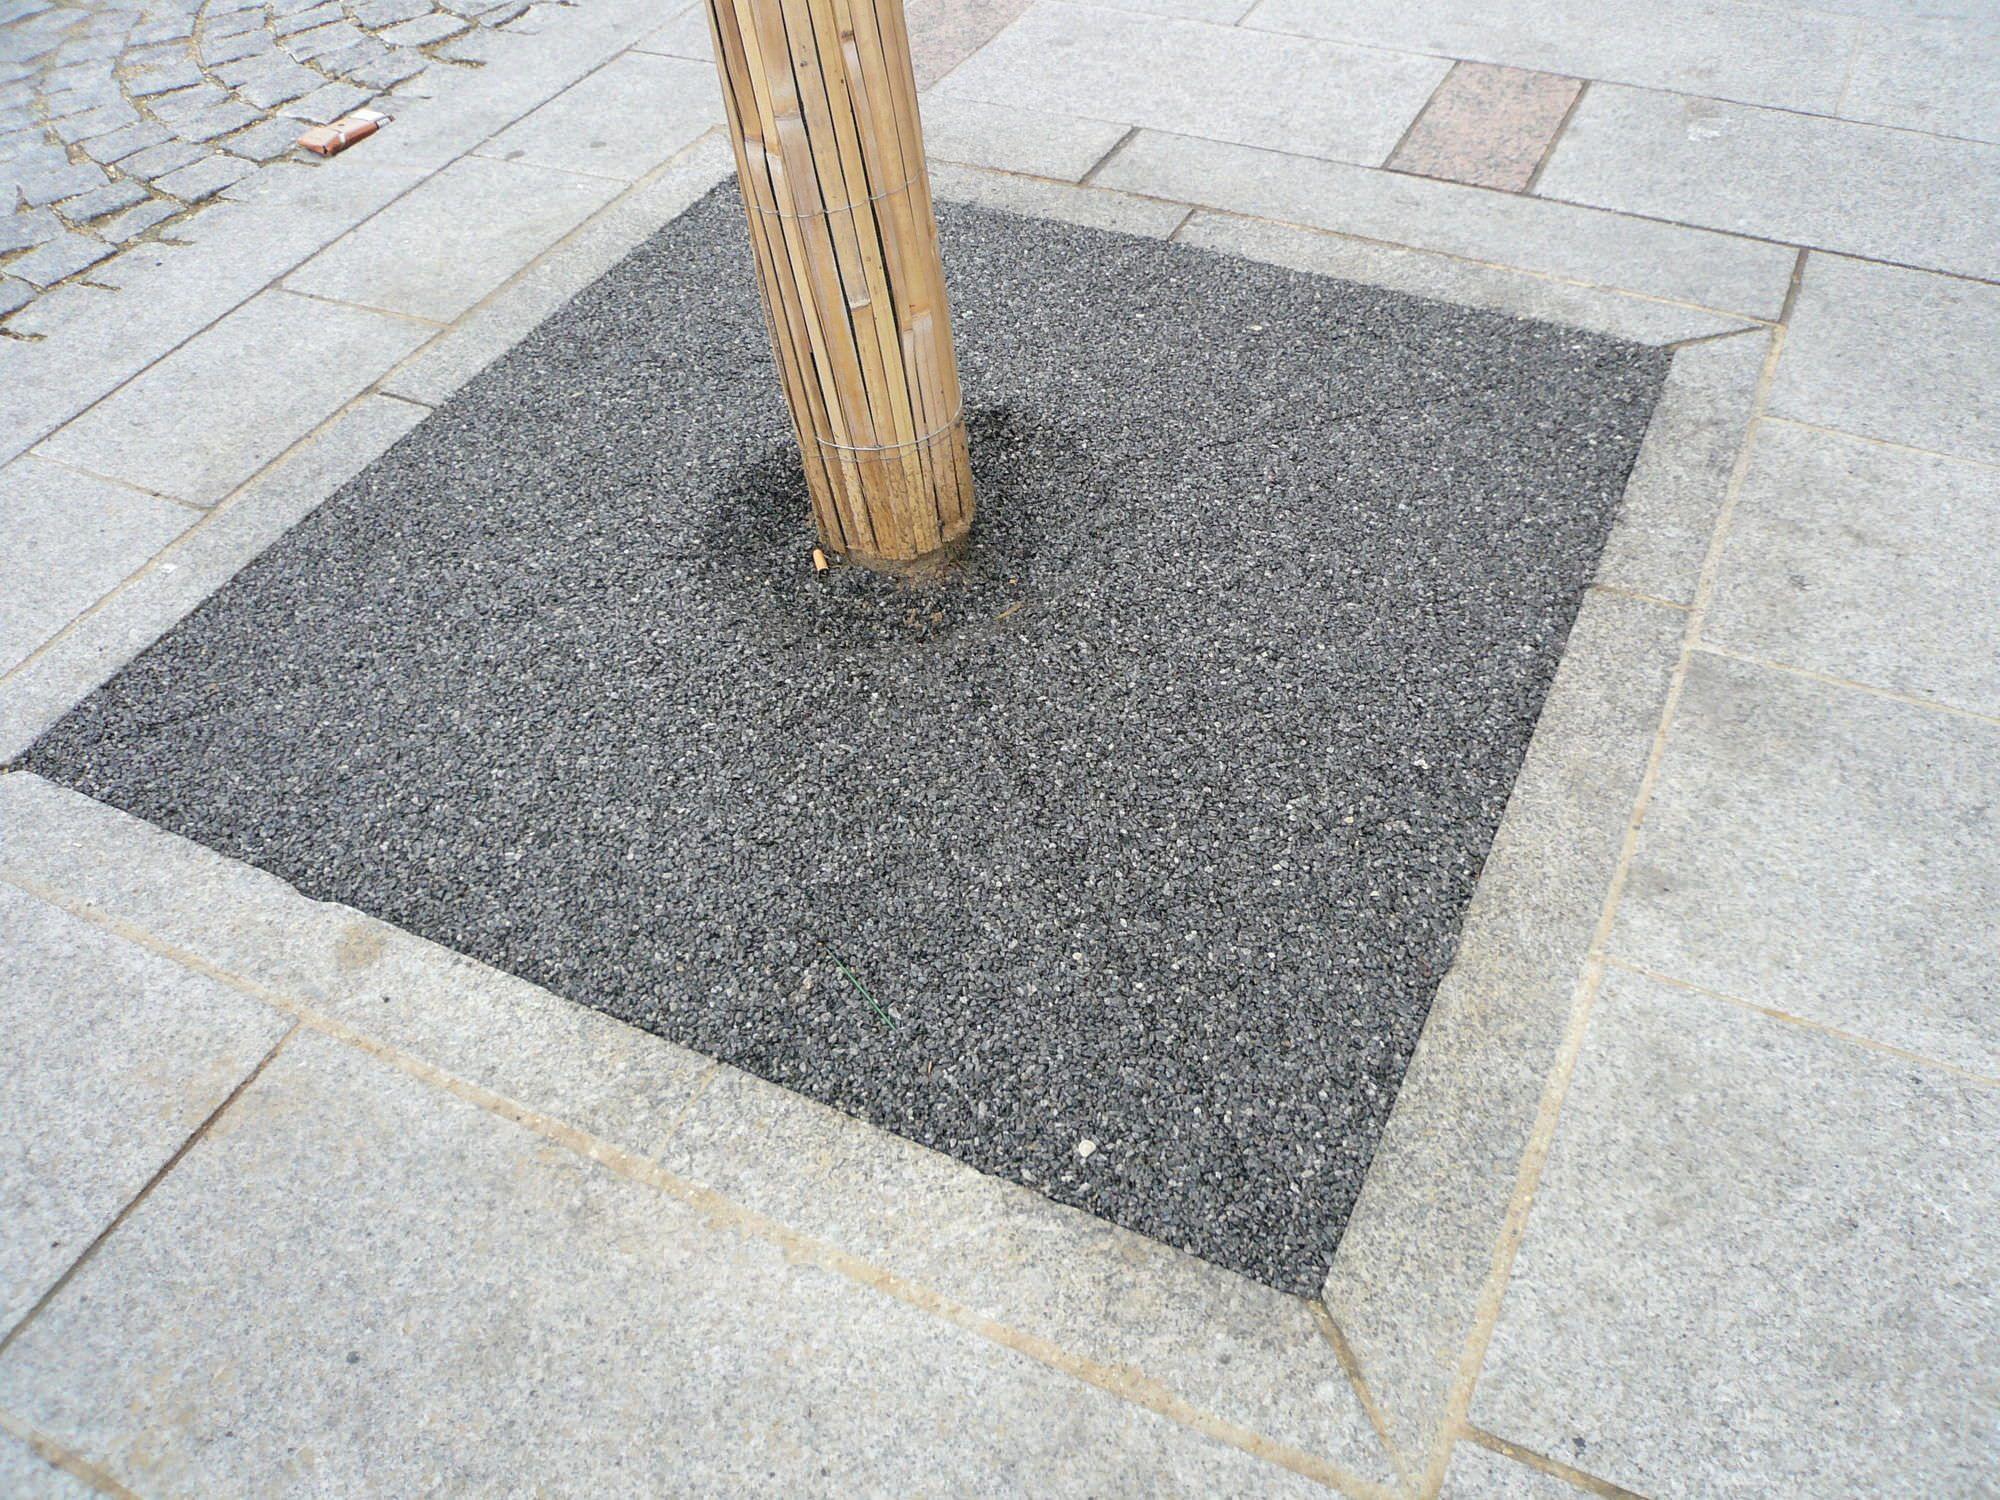 Resultado de imagen para pavimento texturado jard n sensorial ni os pinterest porous - Pavimento jardin ...